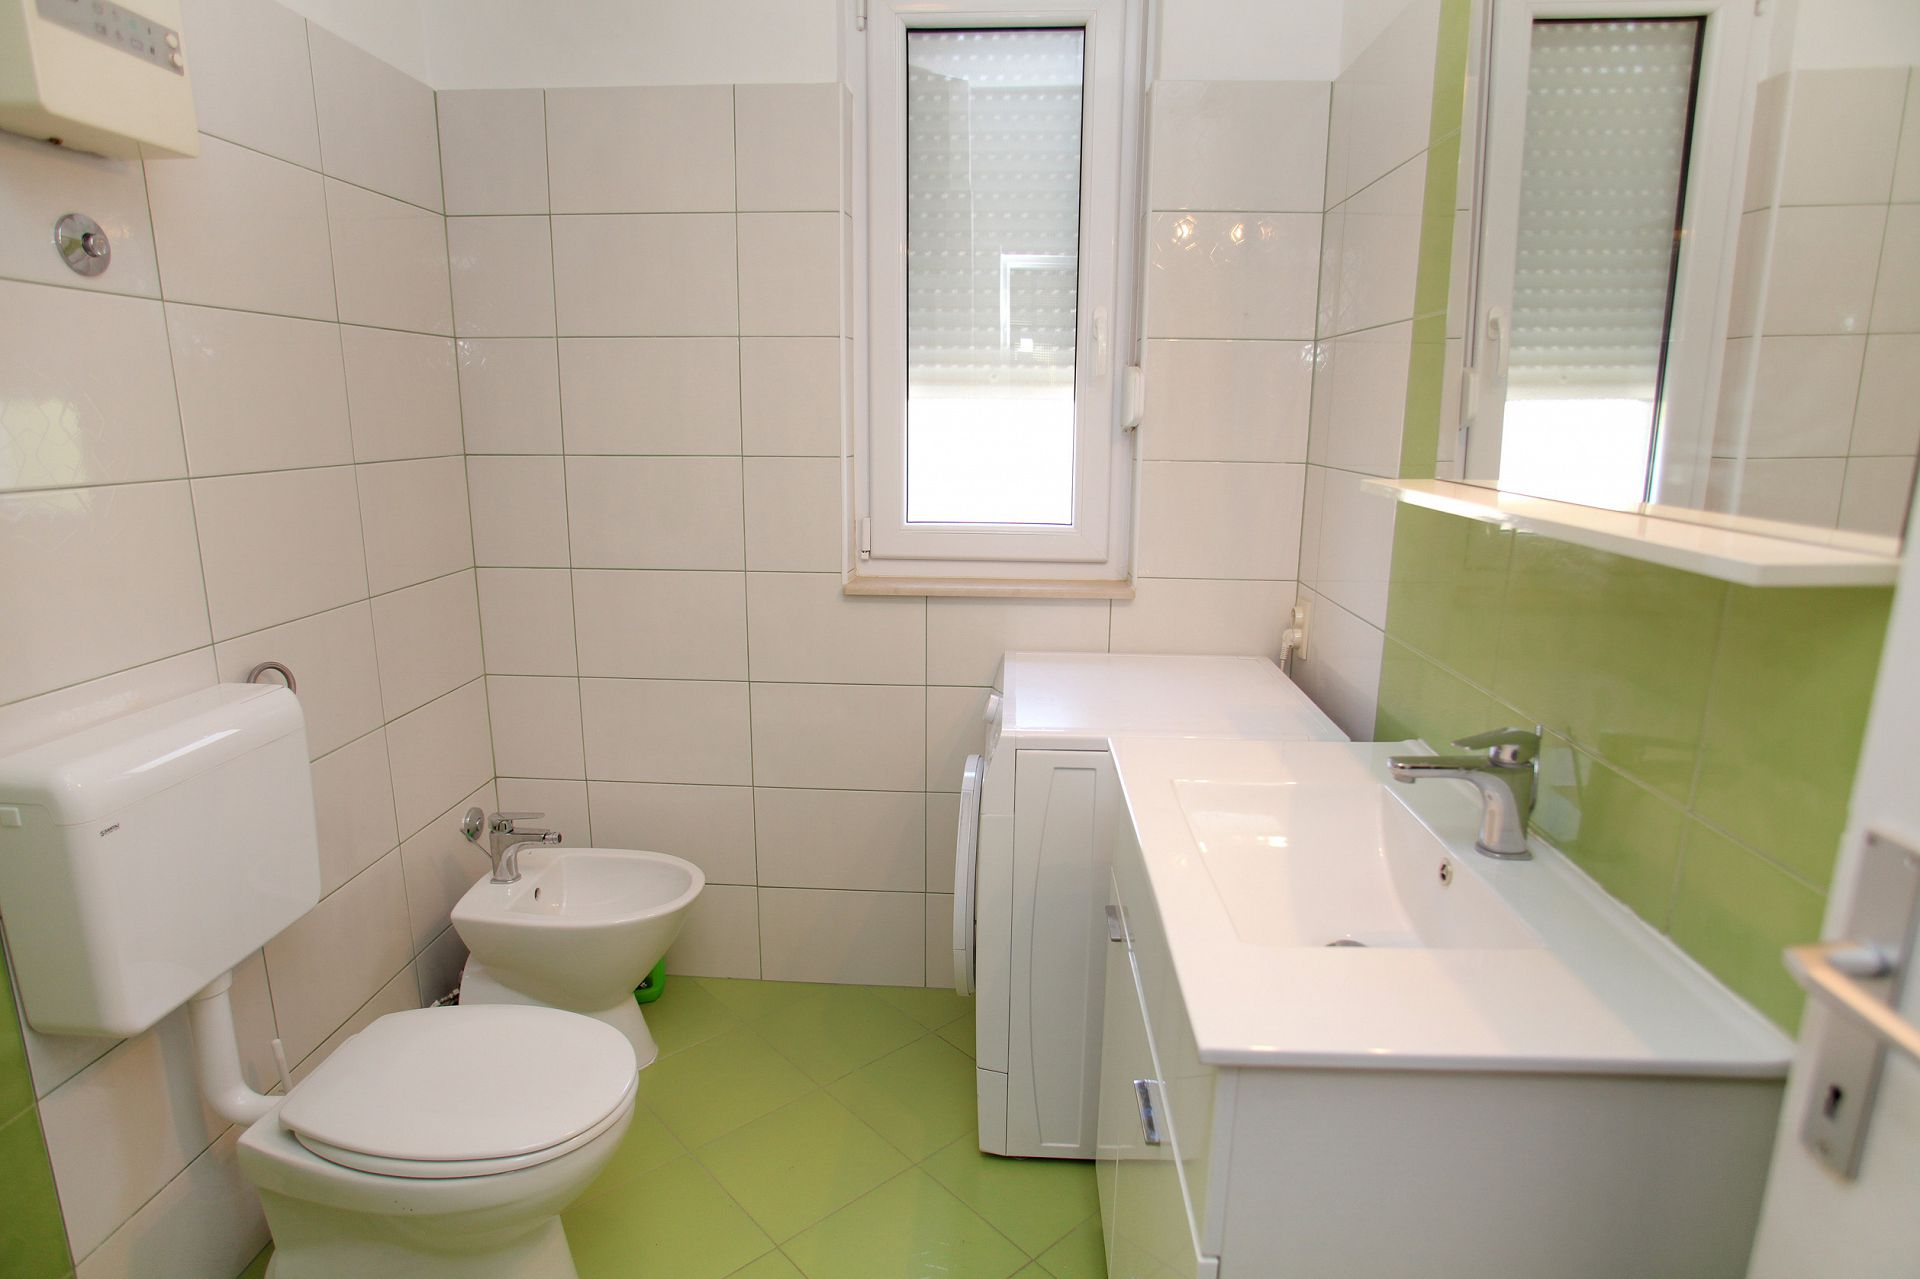 01707TROG  - Trogir - Appartements Croatie - A4(6): salle de bain W-C